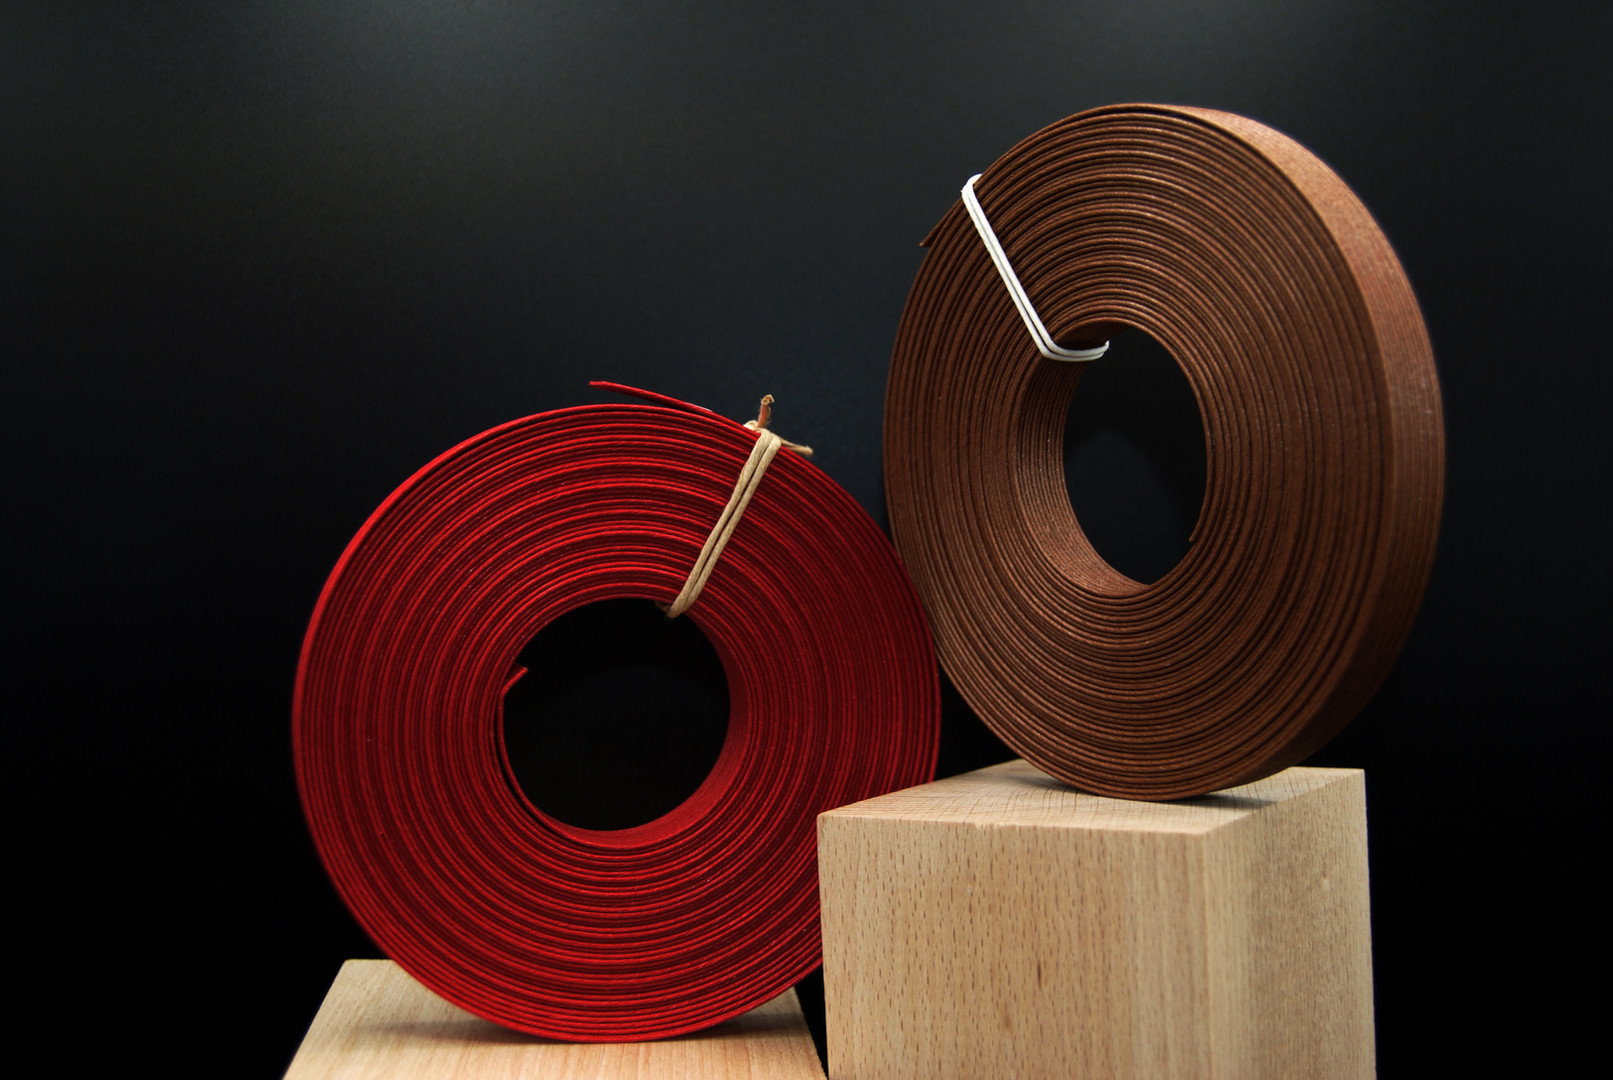 Paperband design